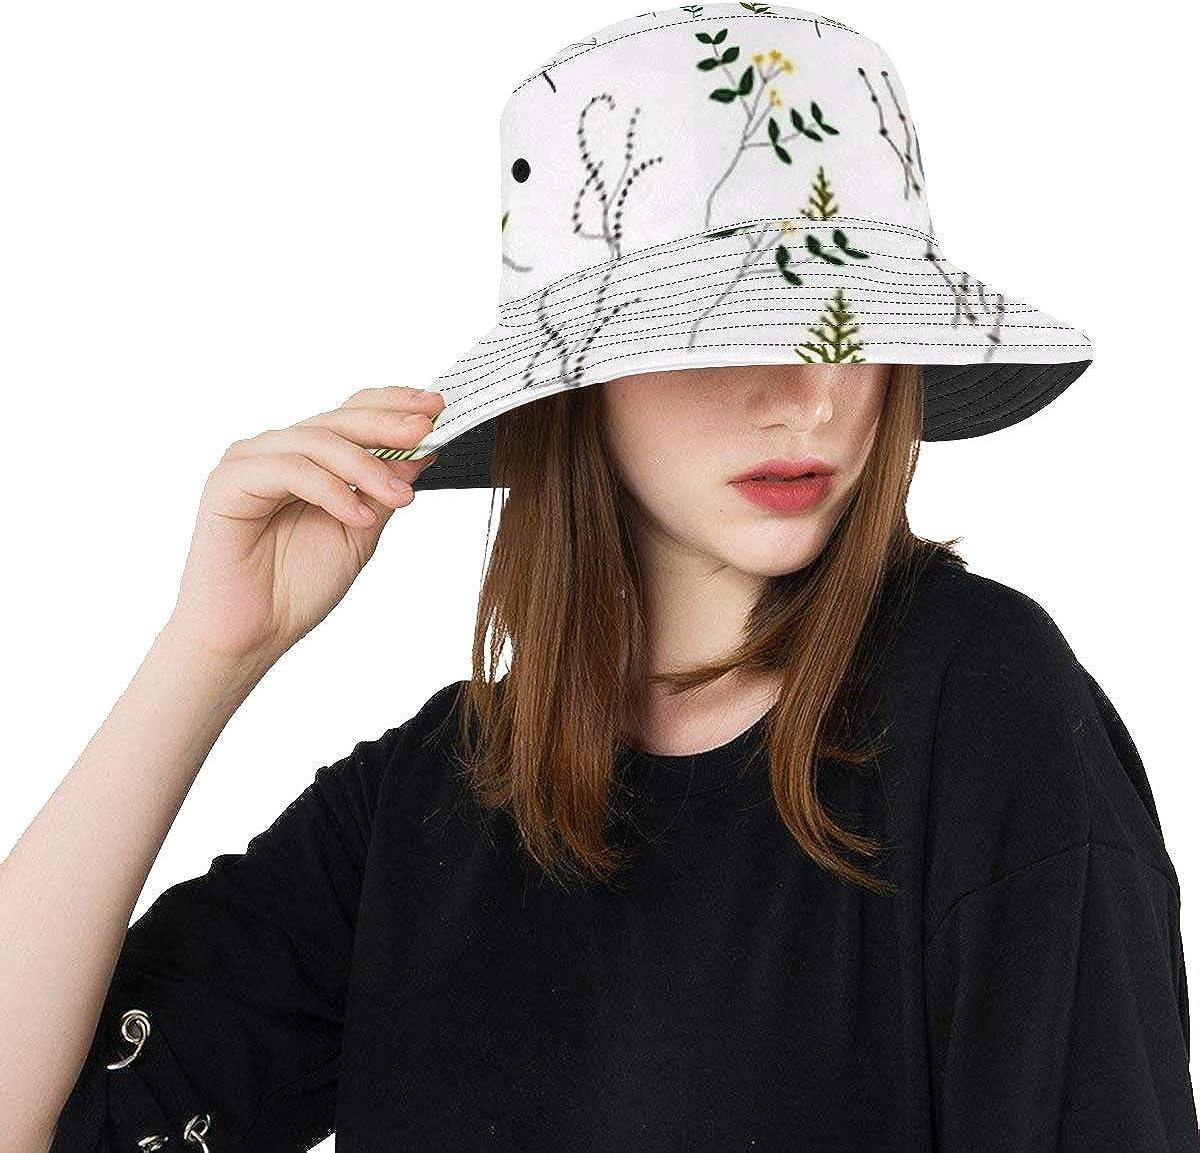 Unique Bucket Hat Floral Elements Collection Design Hand Lowest price challenge C Luxury Drawn